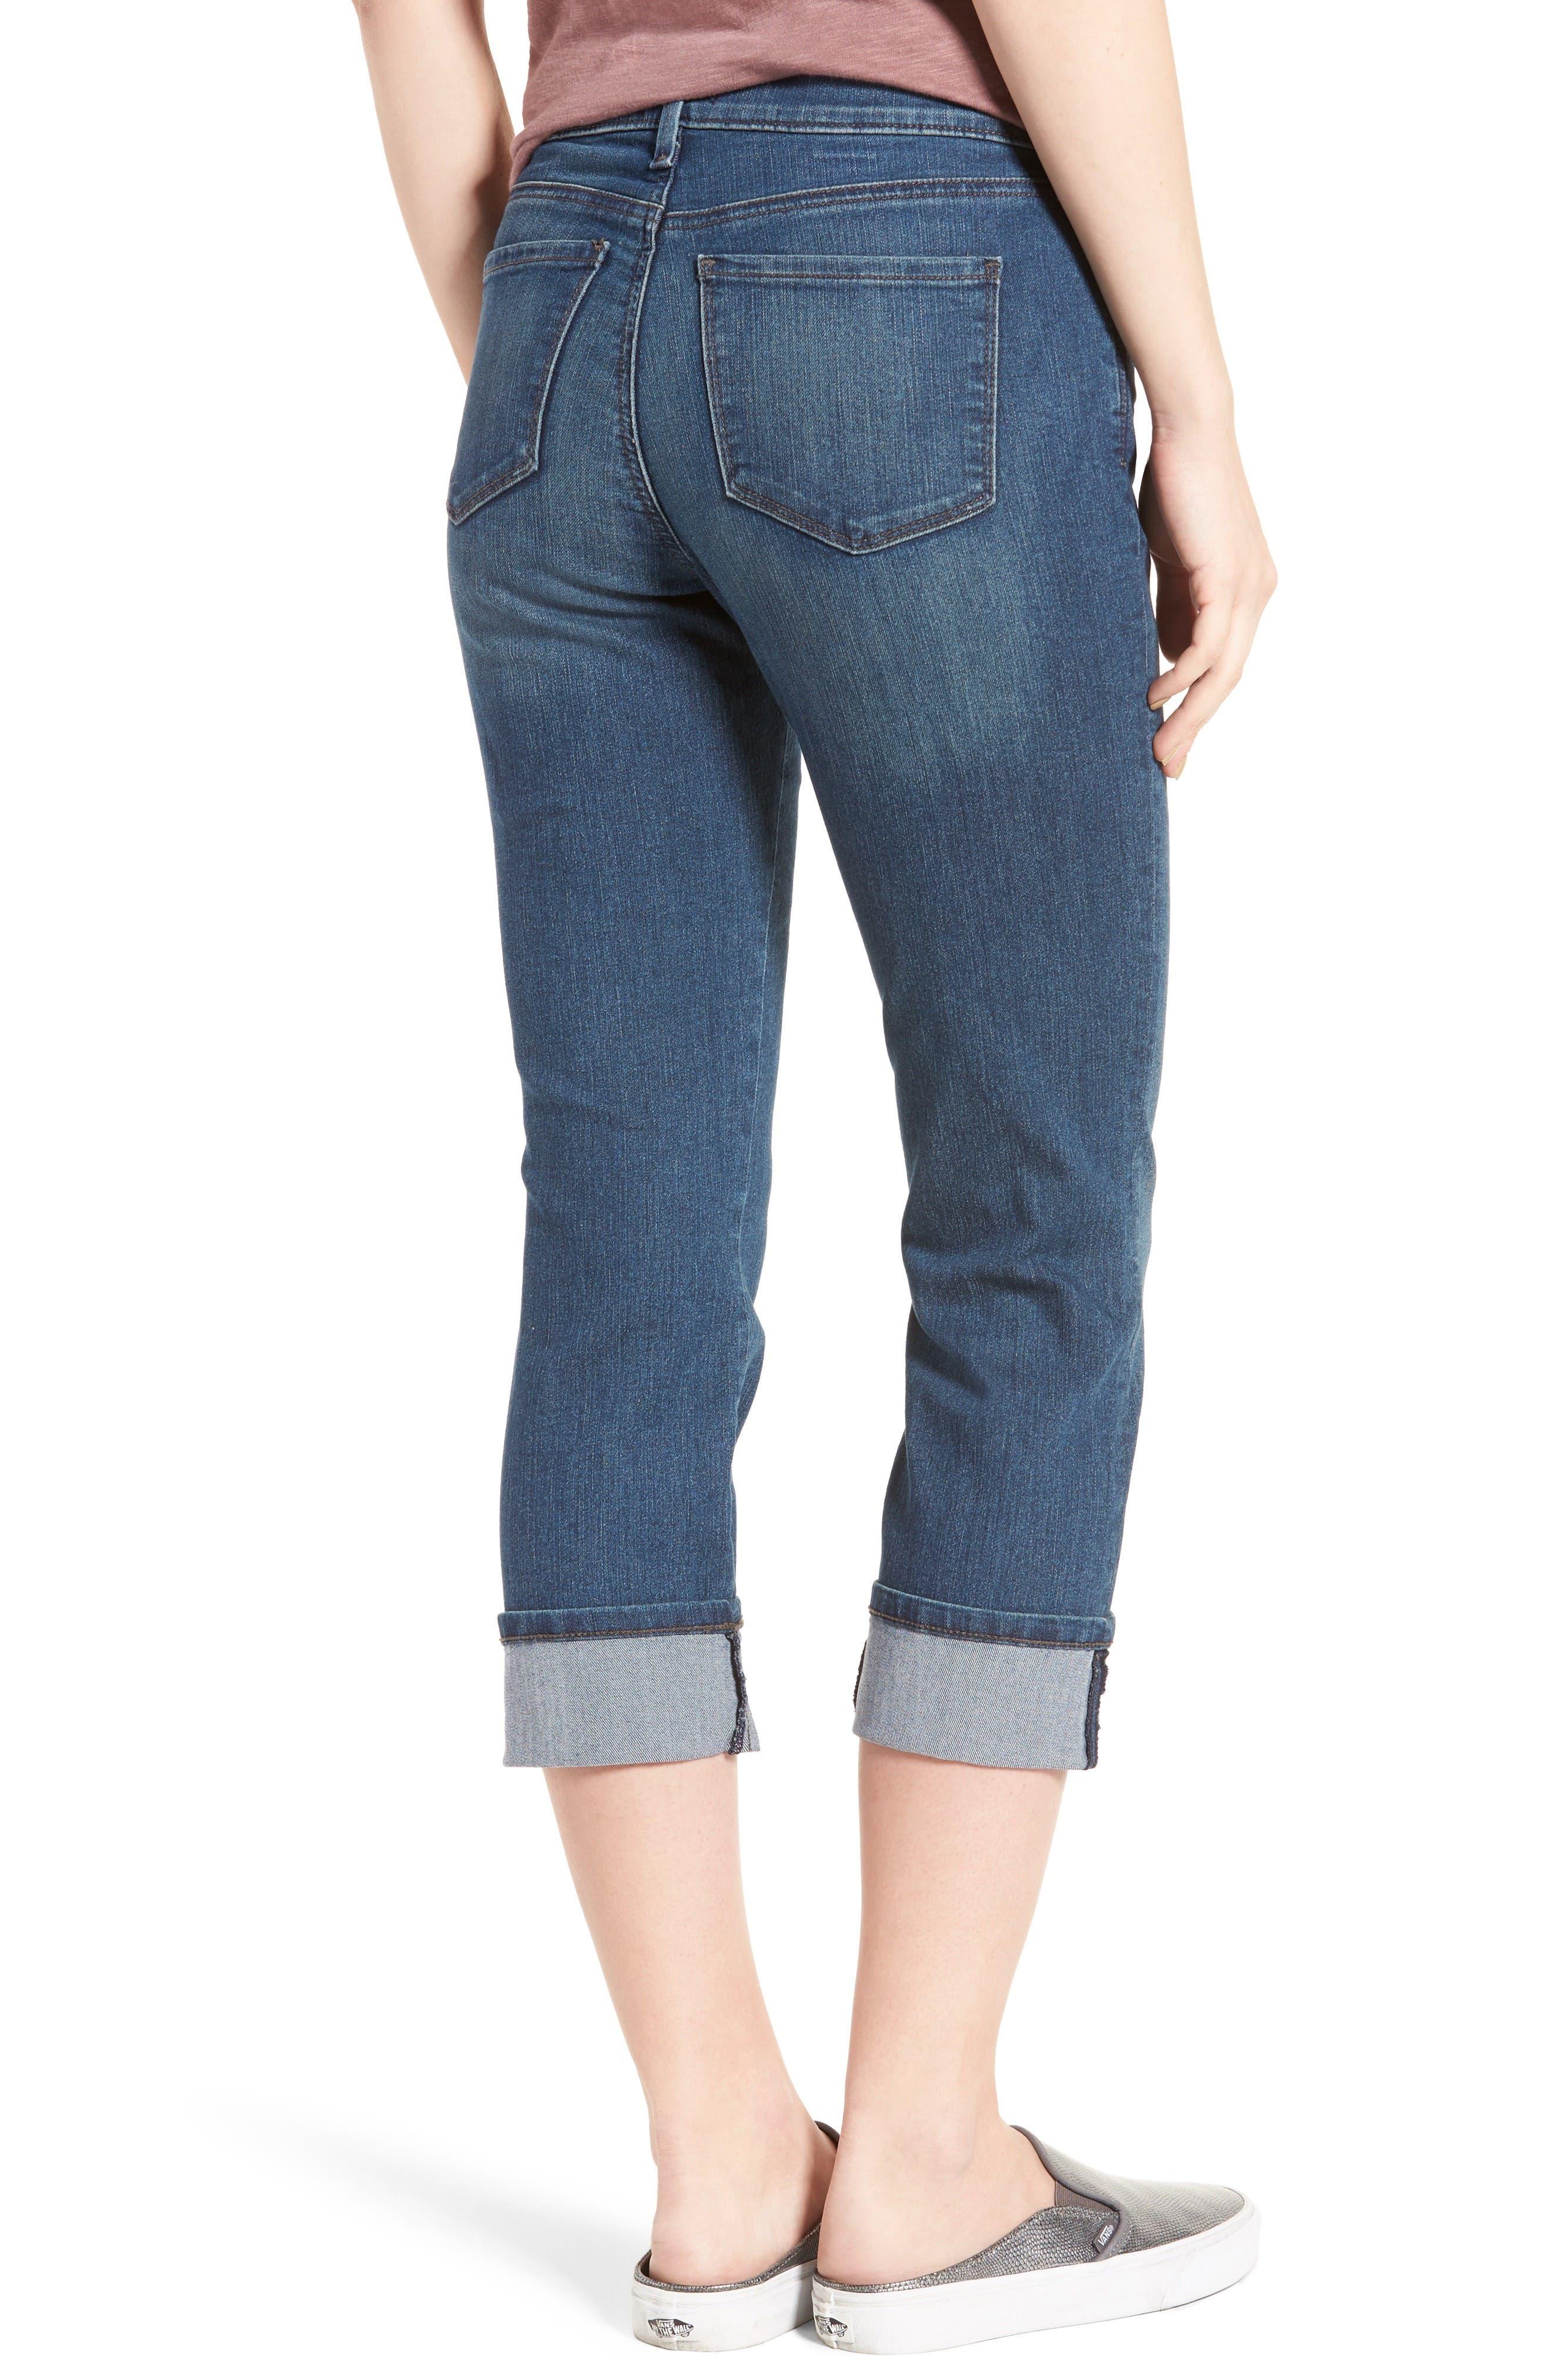 'Dayla' Colored Wide Cuff Capri Jeans,                             Alternate thumbnail 24, color,